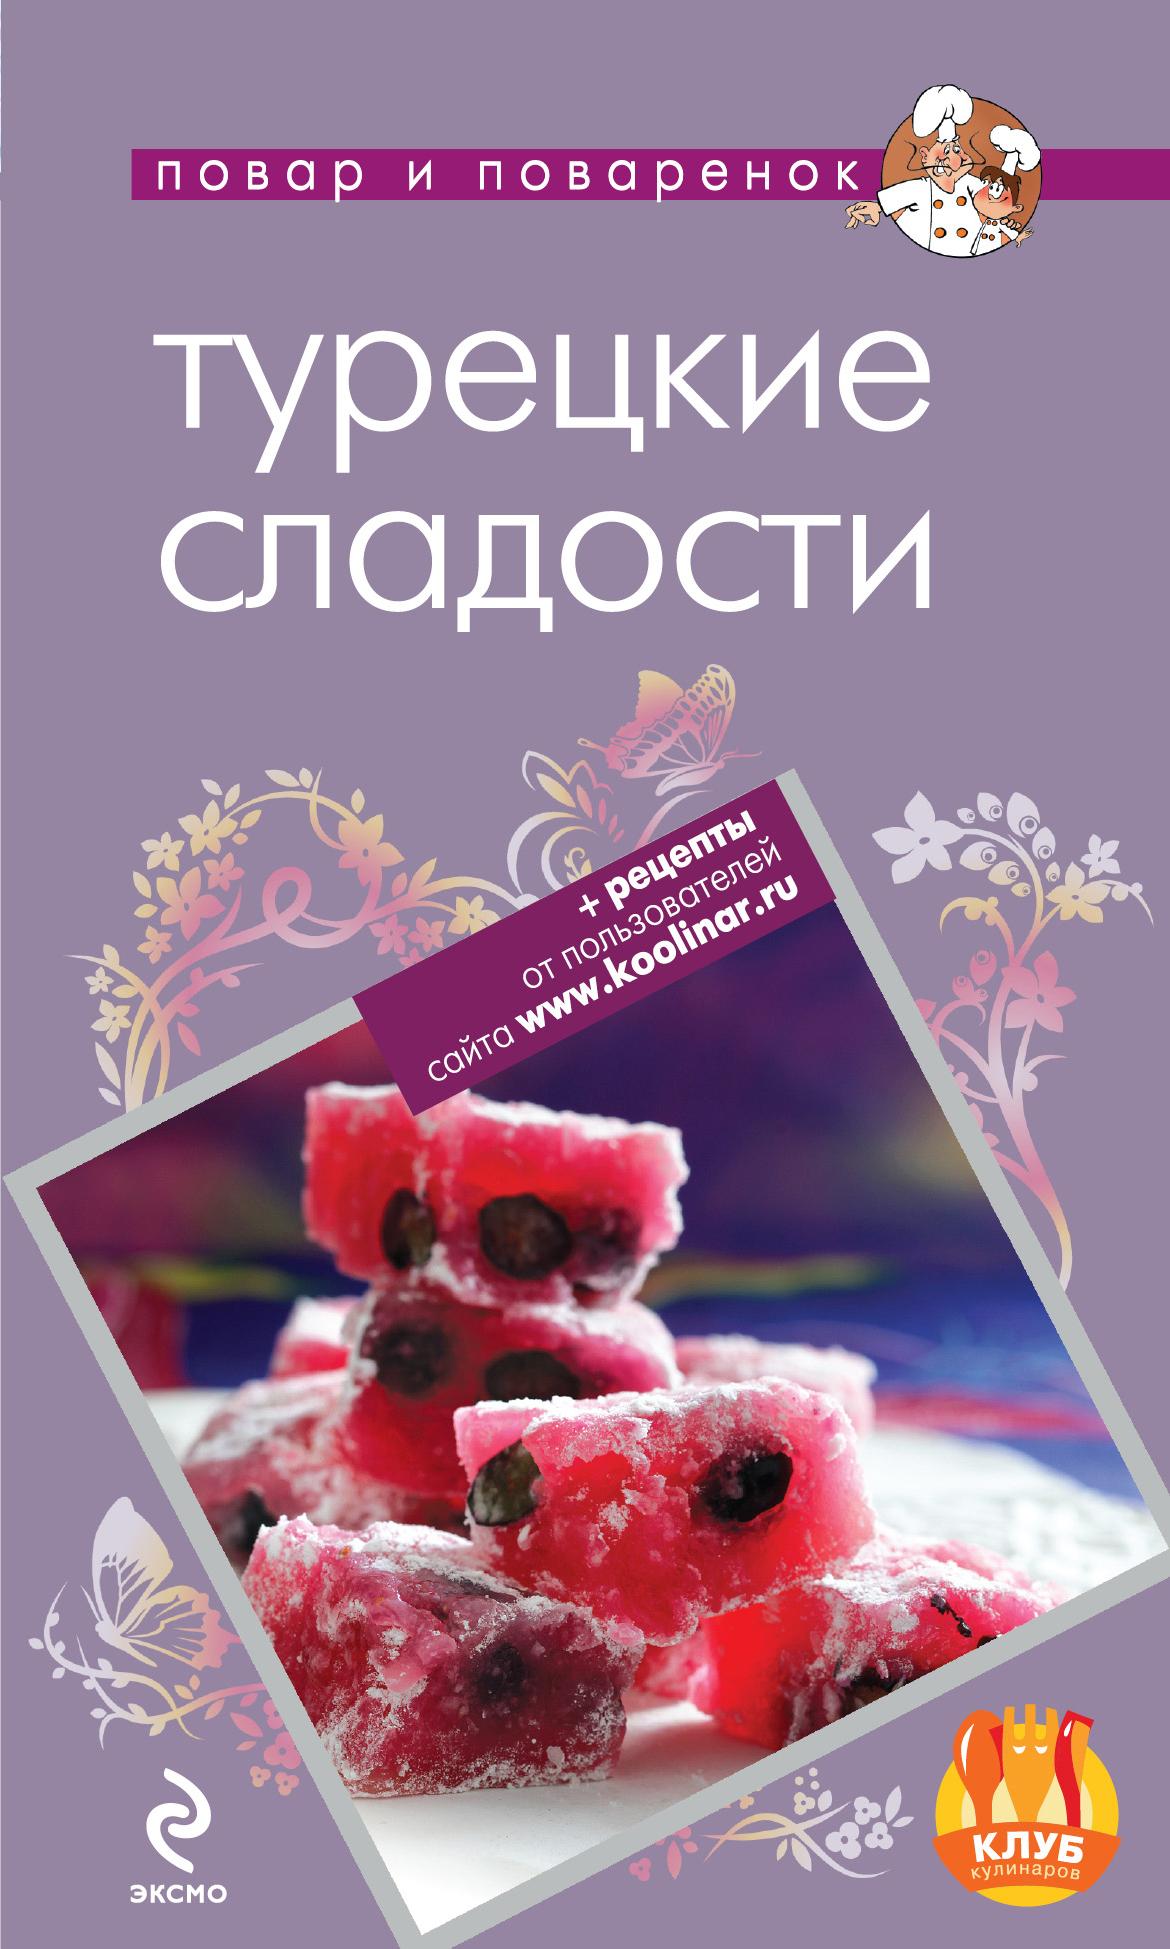 Савинова Н.А. Турецкие сладости